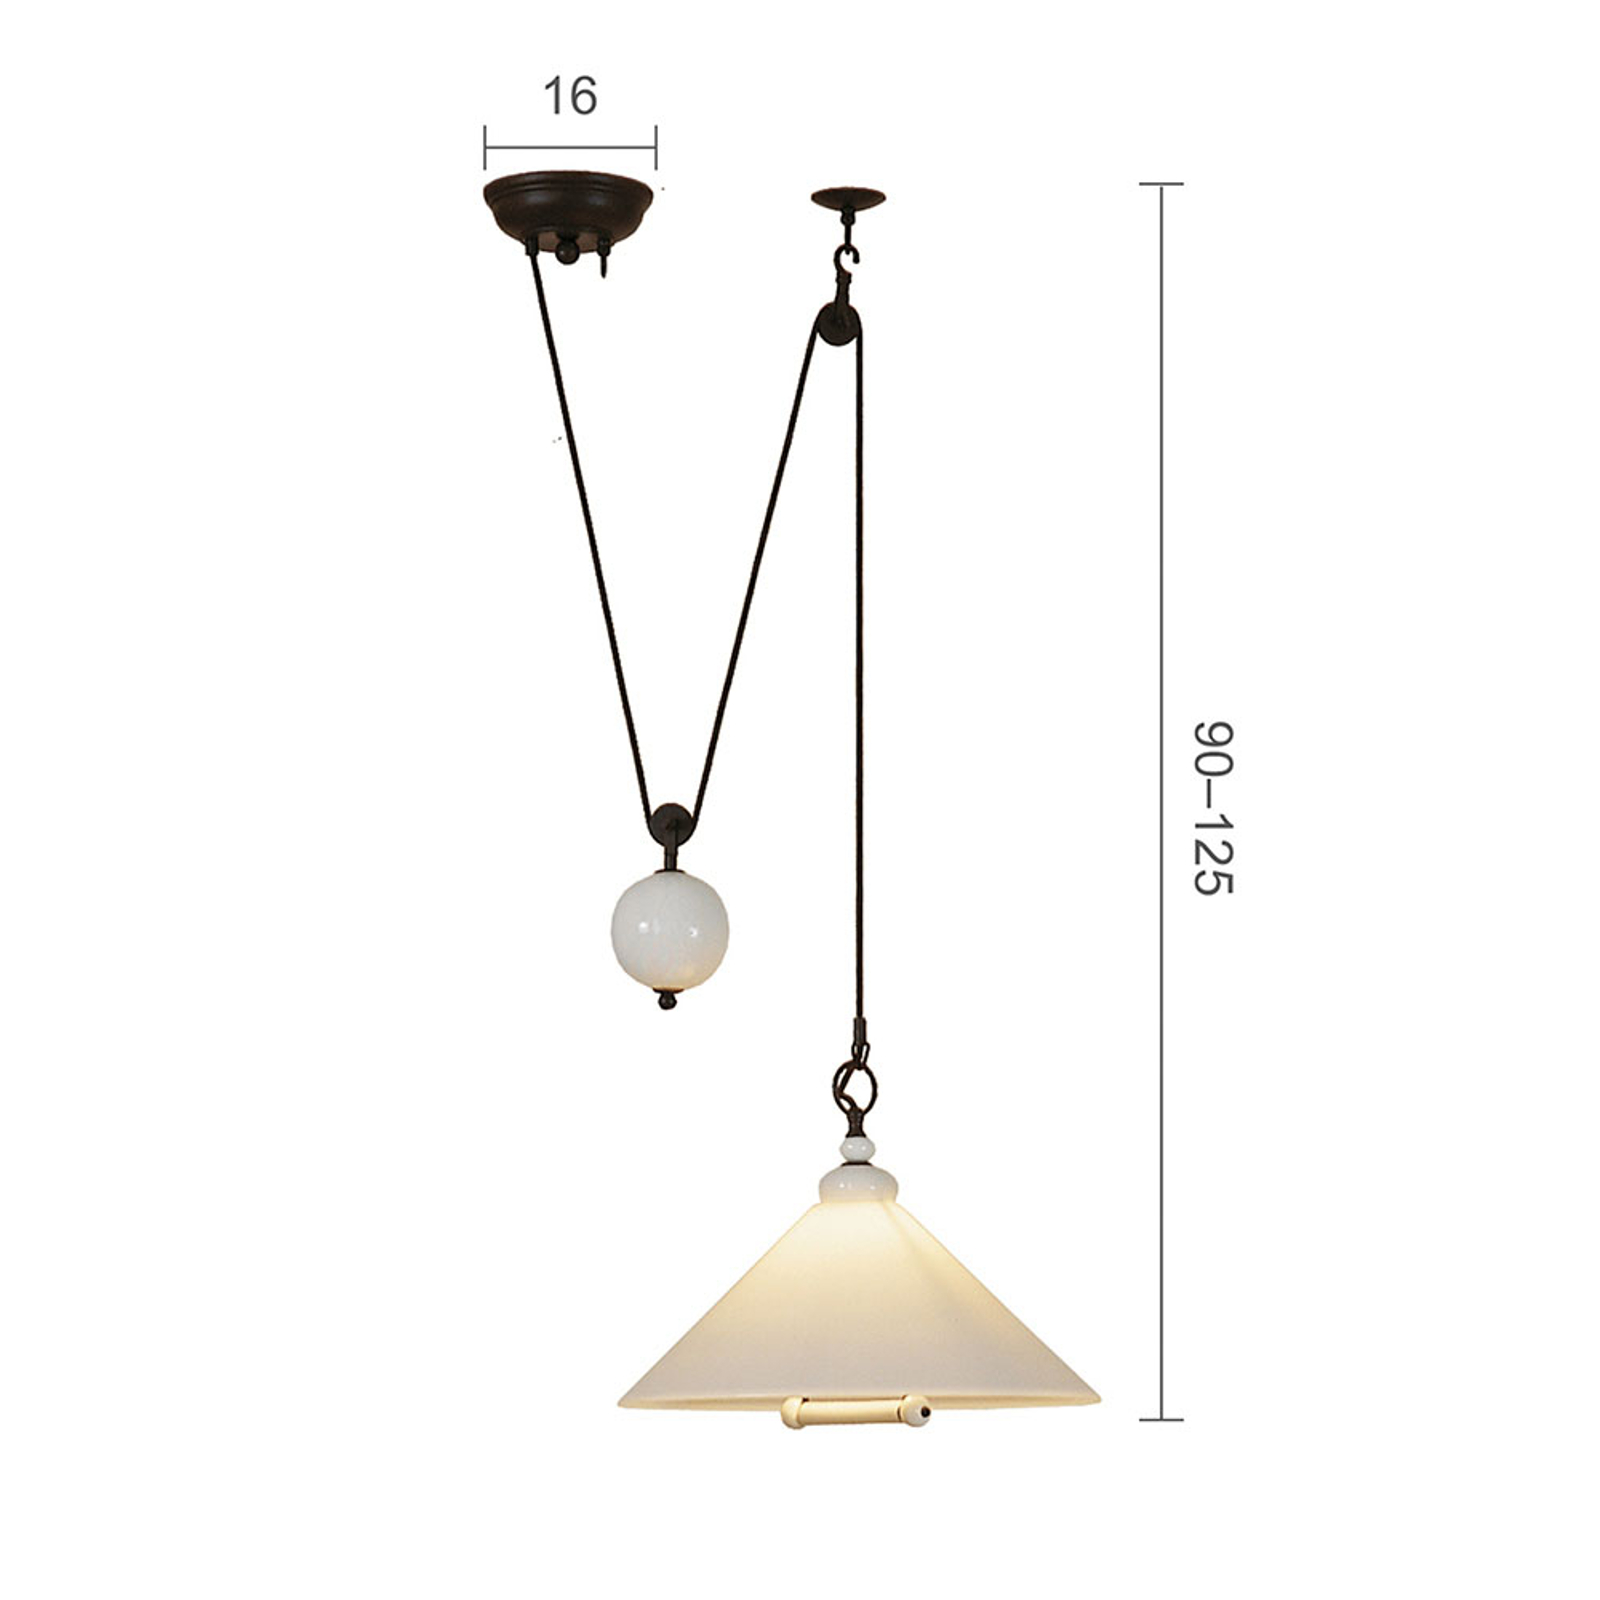 Menzel Provence La Maison hanglamp kap opaal Ø39cm